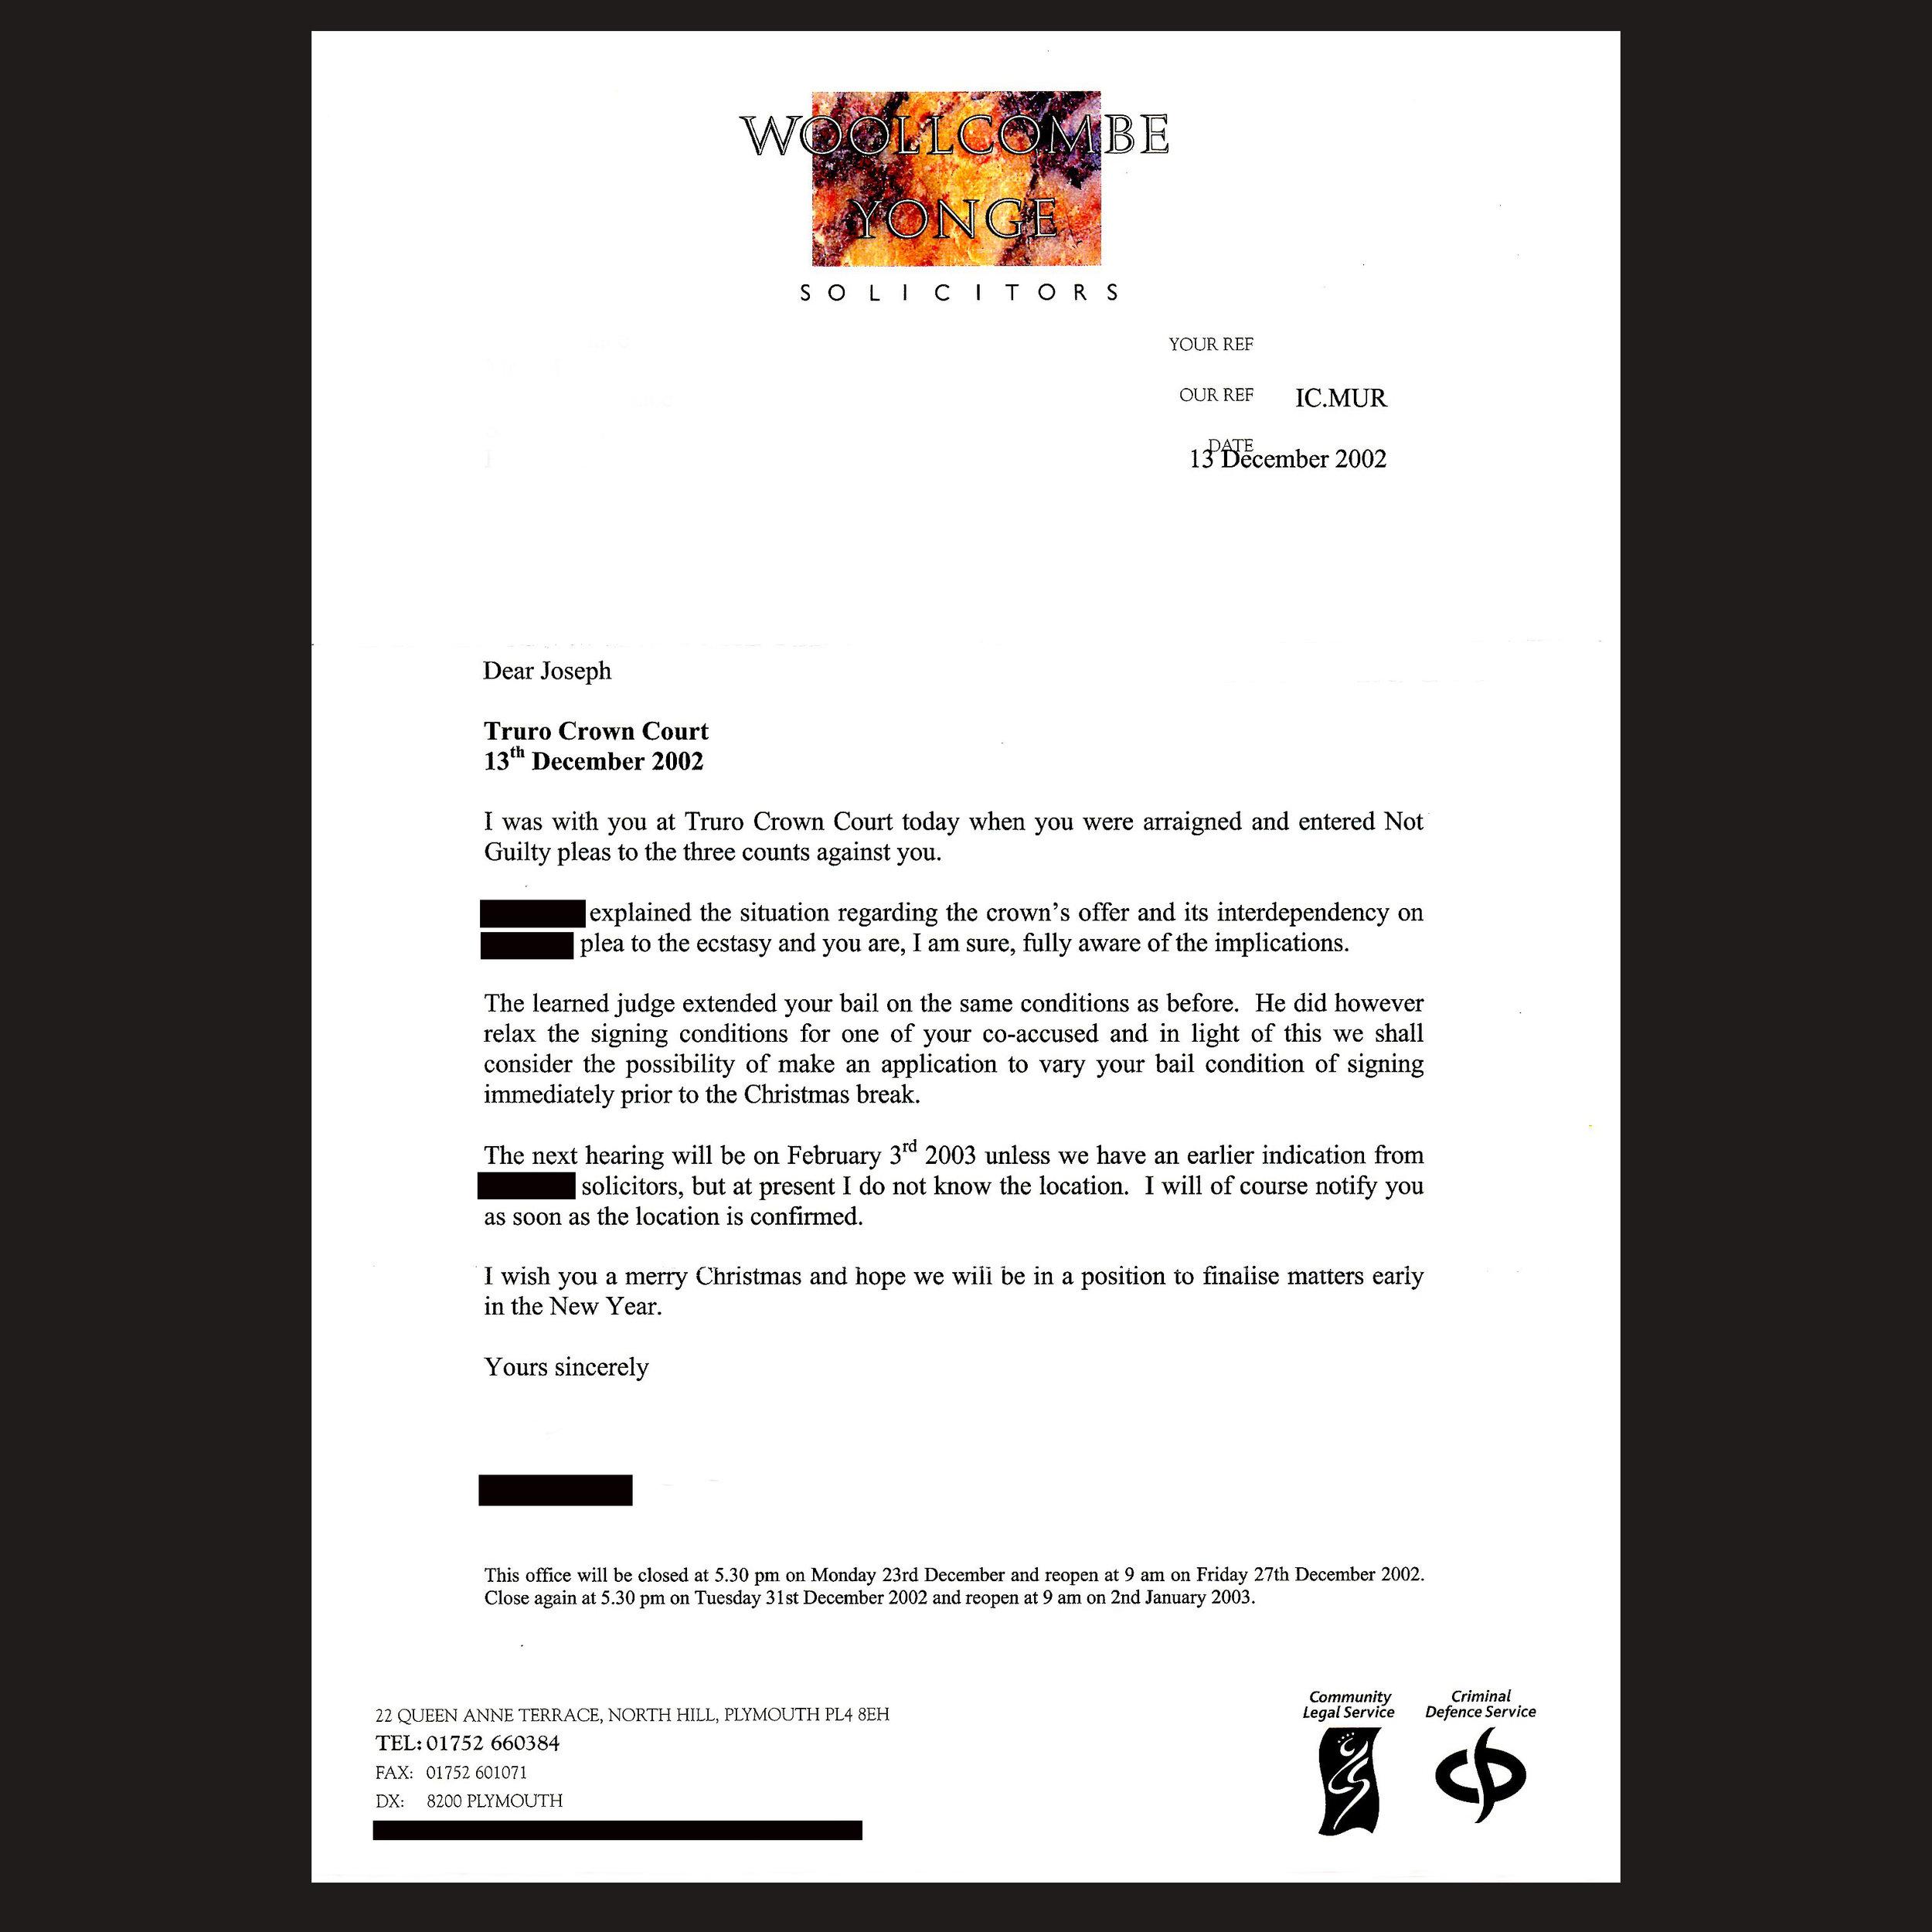 JM Bail 126 - Solicitor Letter 2 - Dec 2002 - Not Guilty.jpg